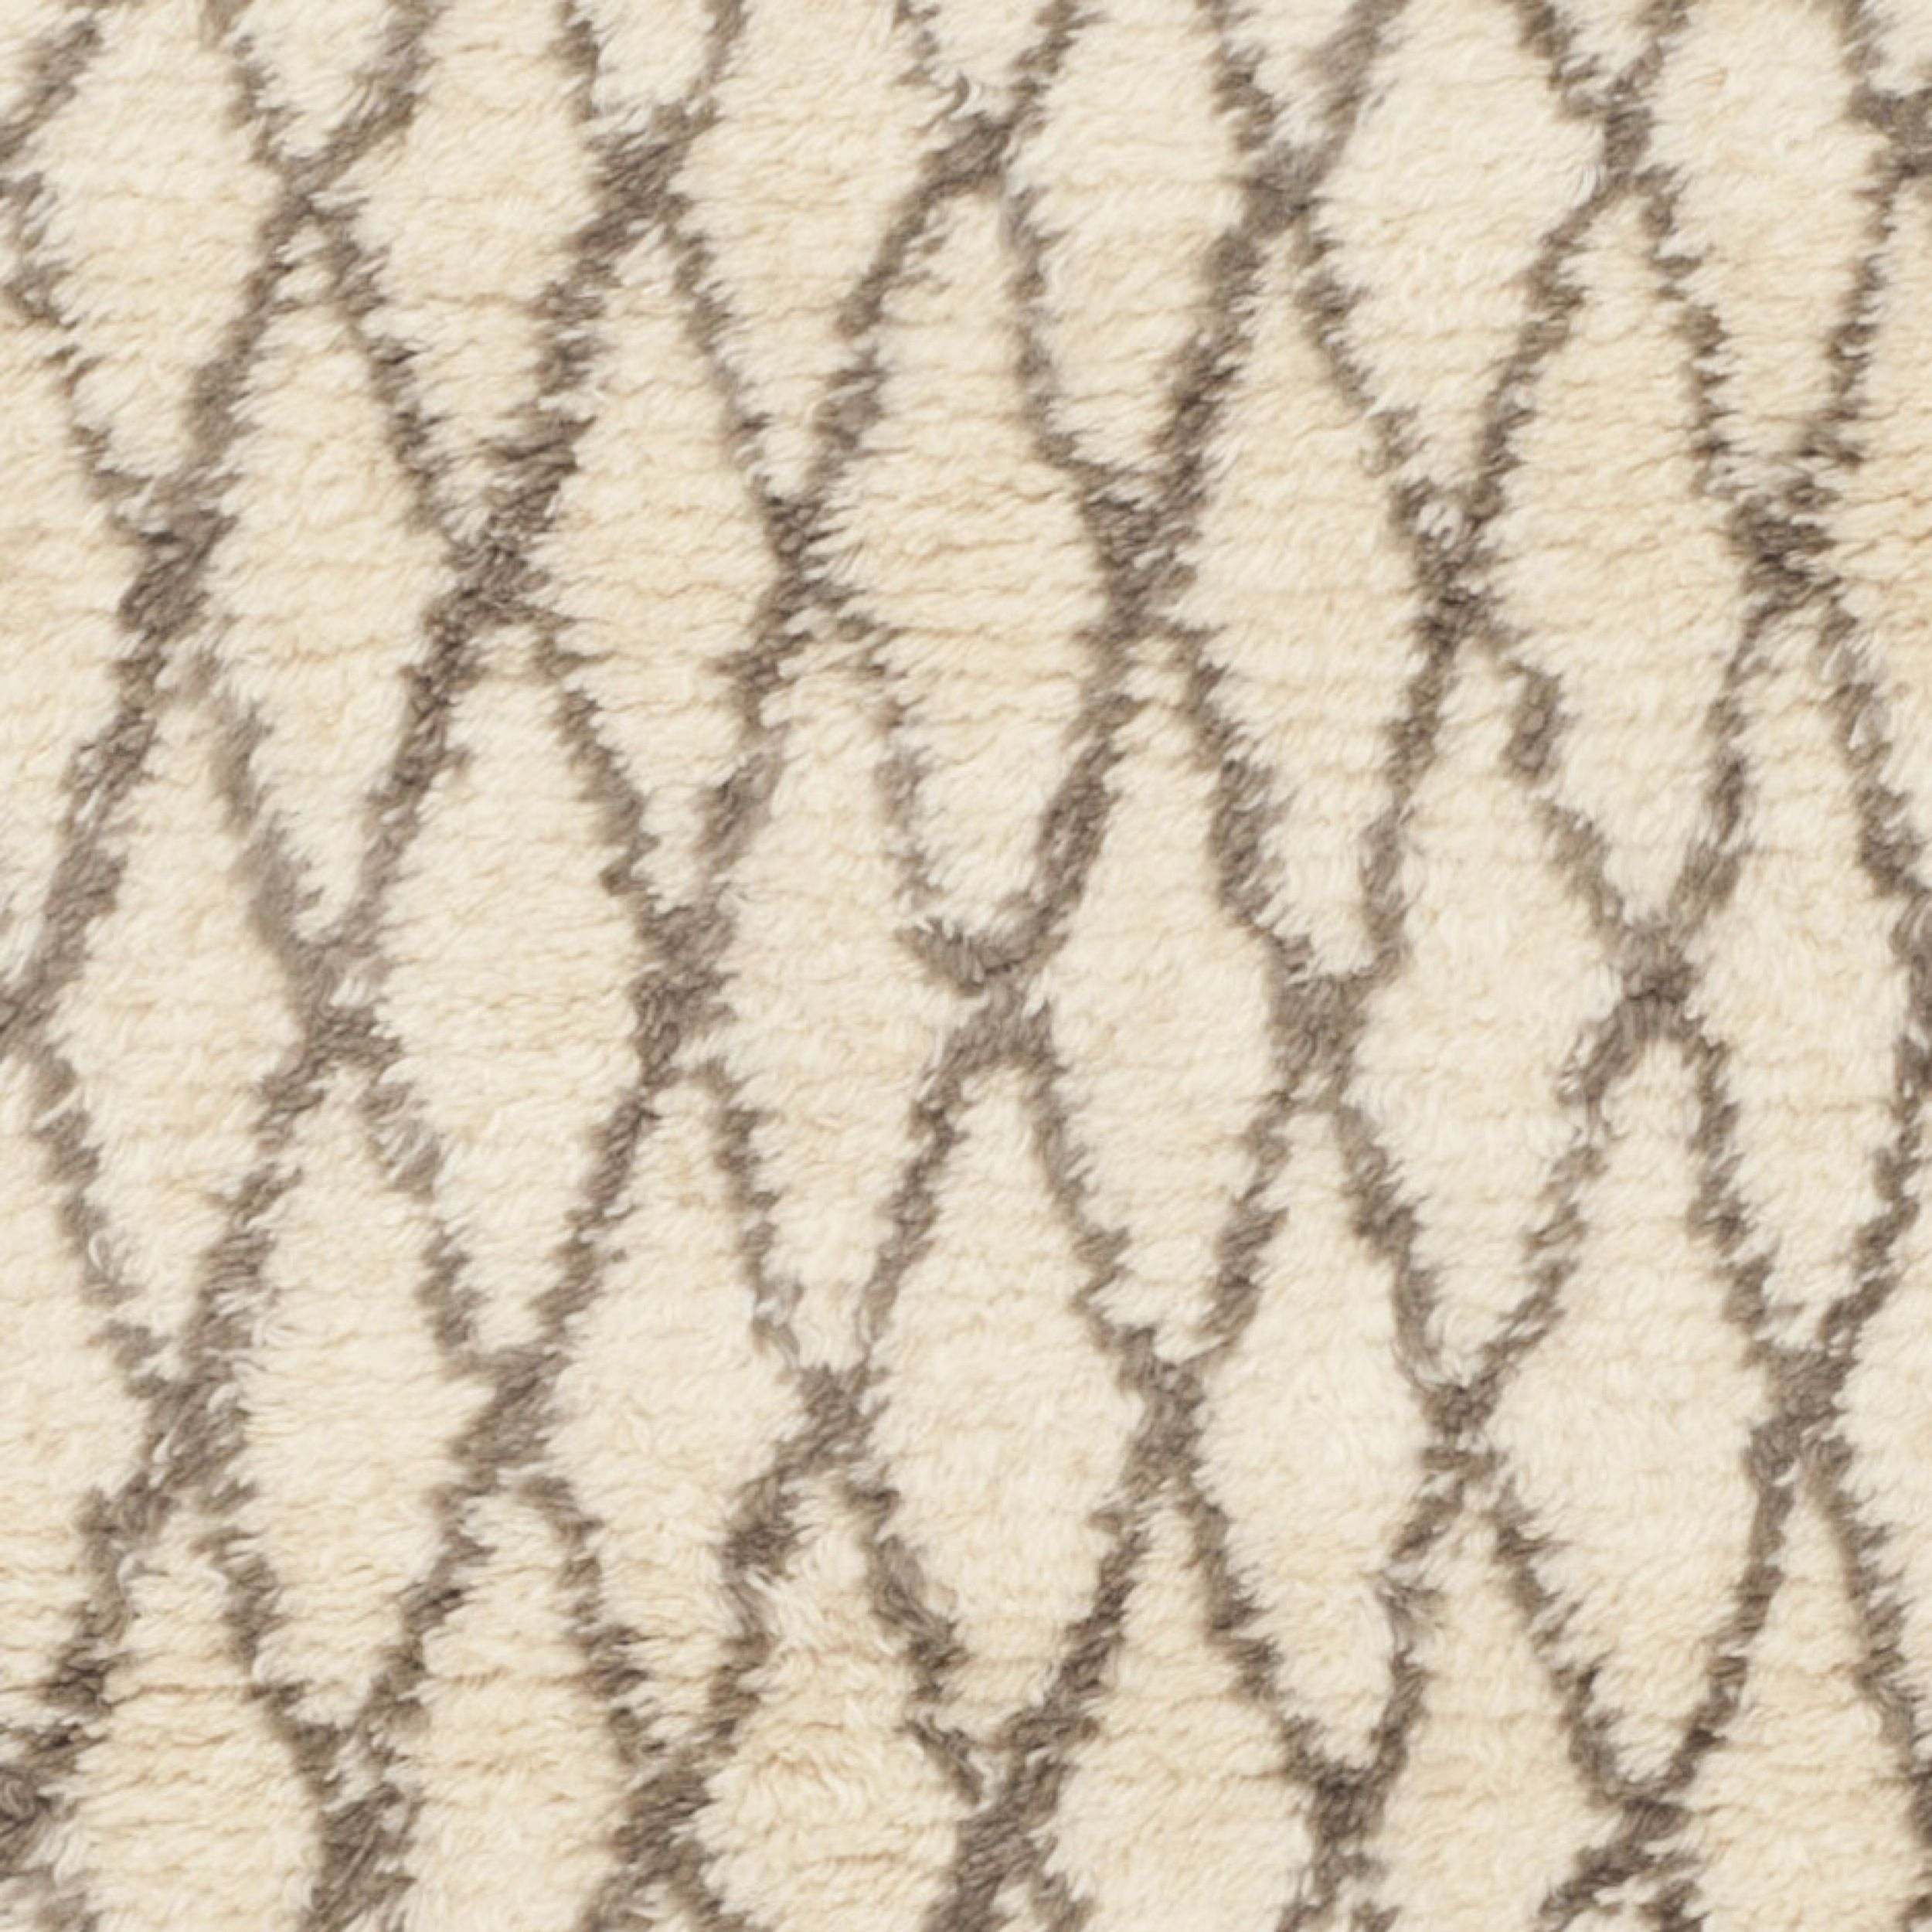 Safavieh Handmade Casablanca Moroccan White Grey N Z Wool Shag Rug 6 X 9 Overstock Com Shopping The Best Deals On 5x8 Wool Shag Rug 6x9 Rugs Safavieh